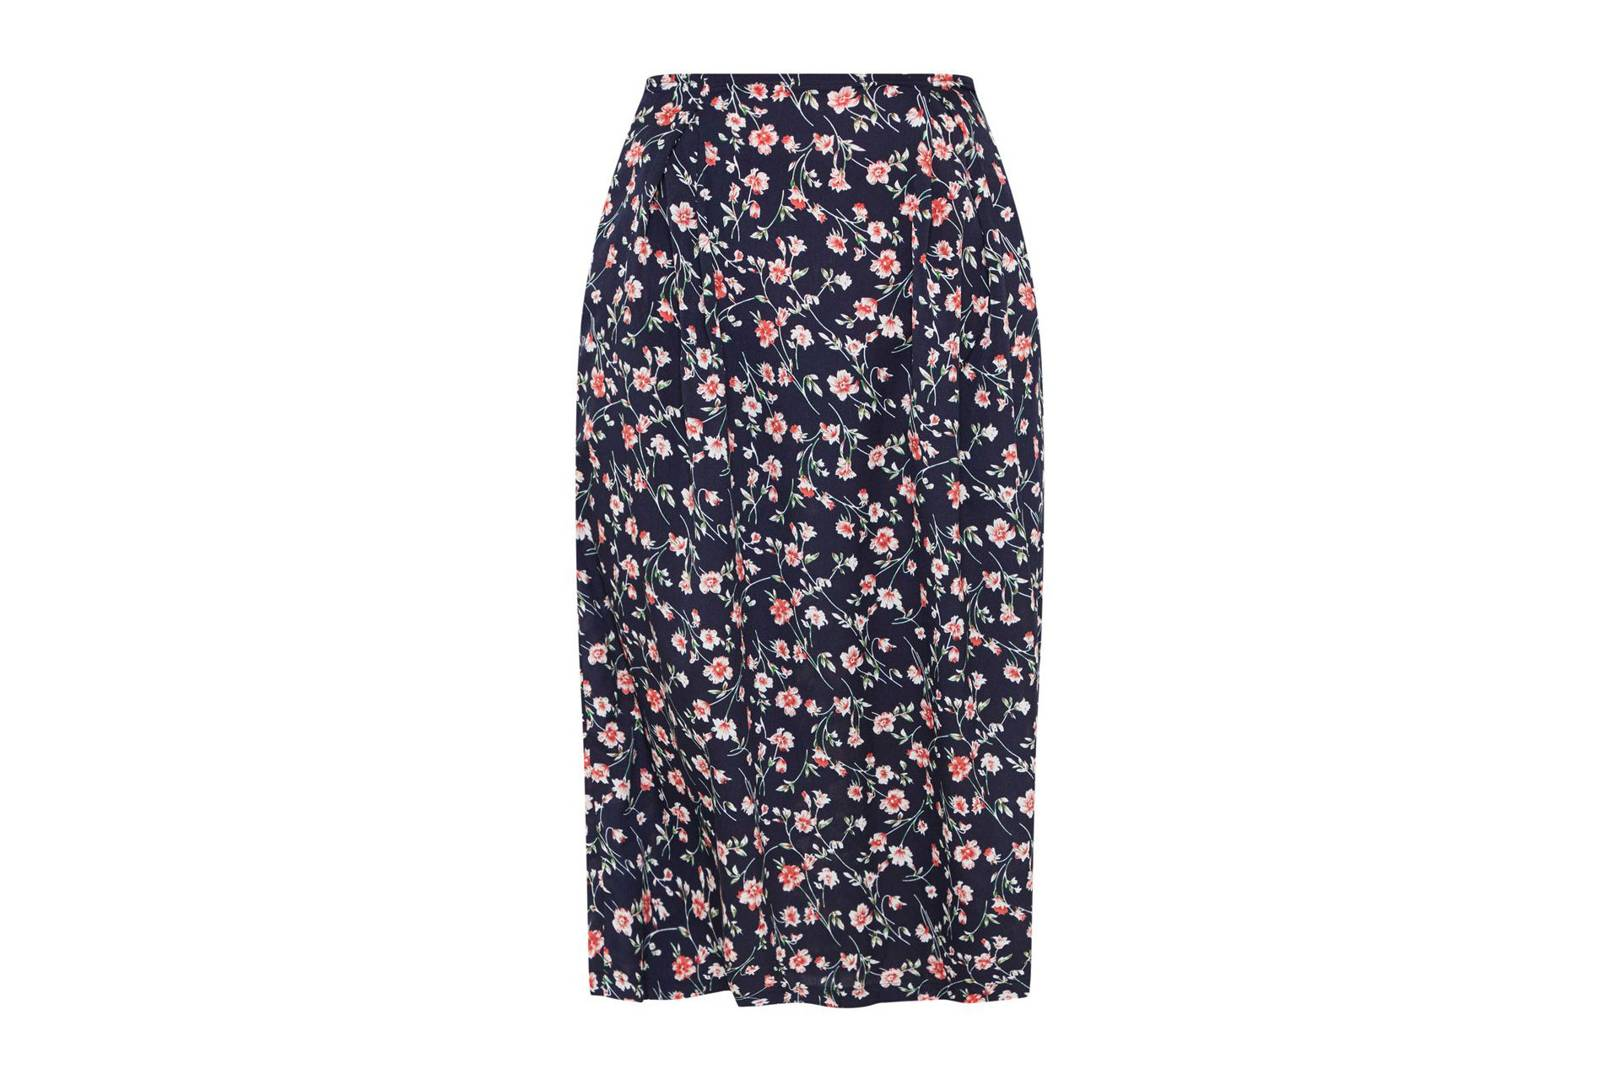 ba8eecfee The Best Midi Skirts To Buy Now   British Vogue